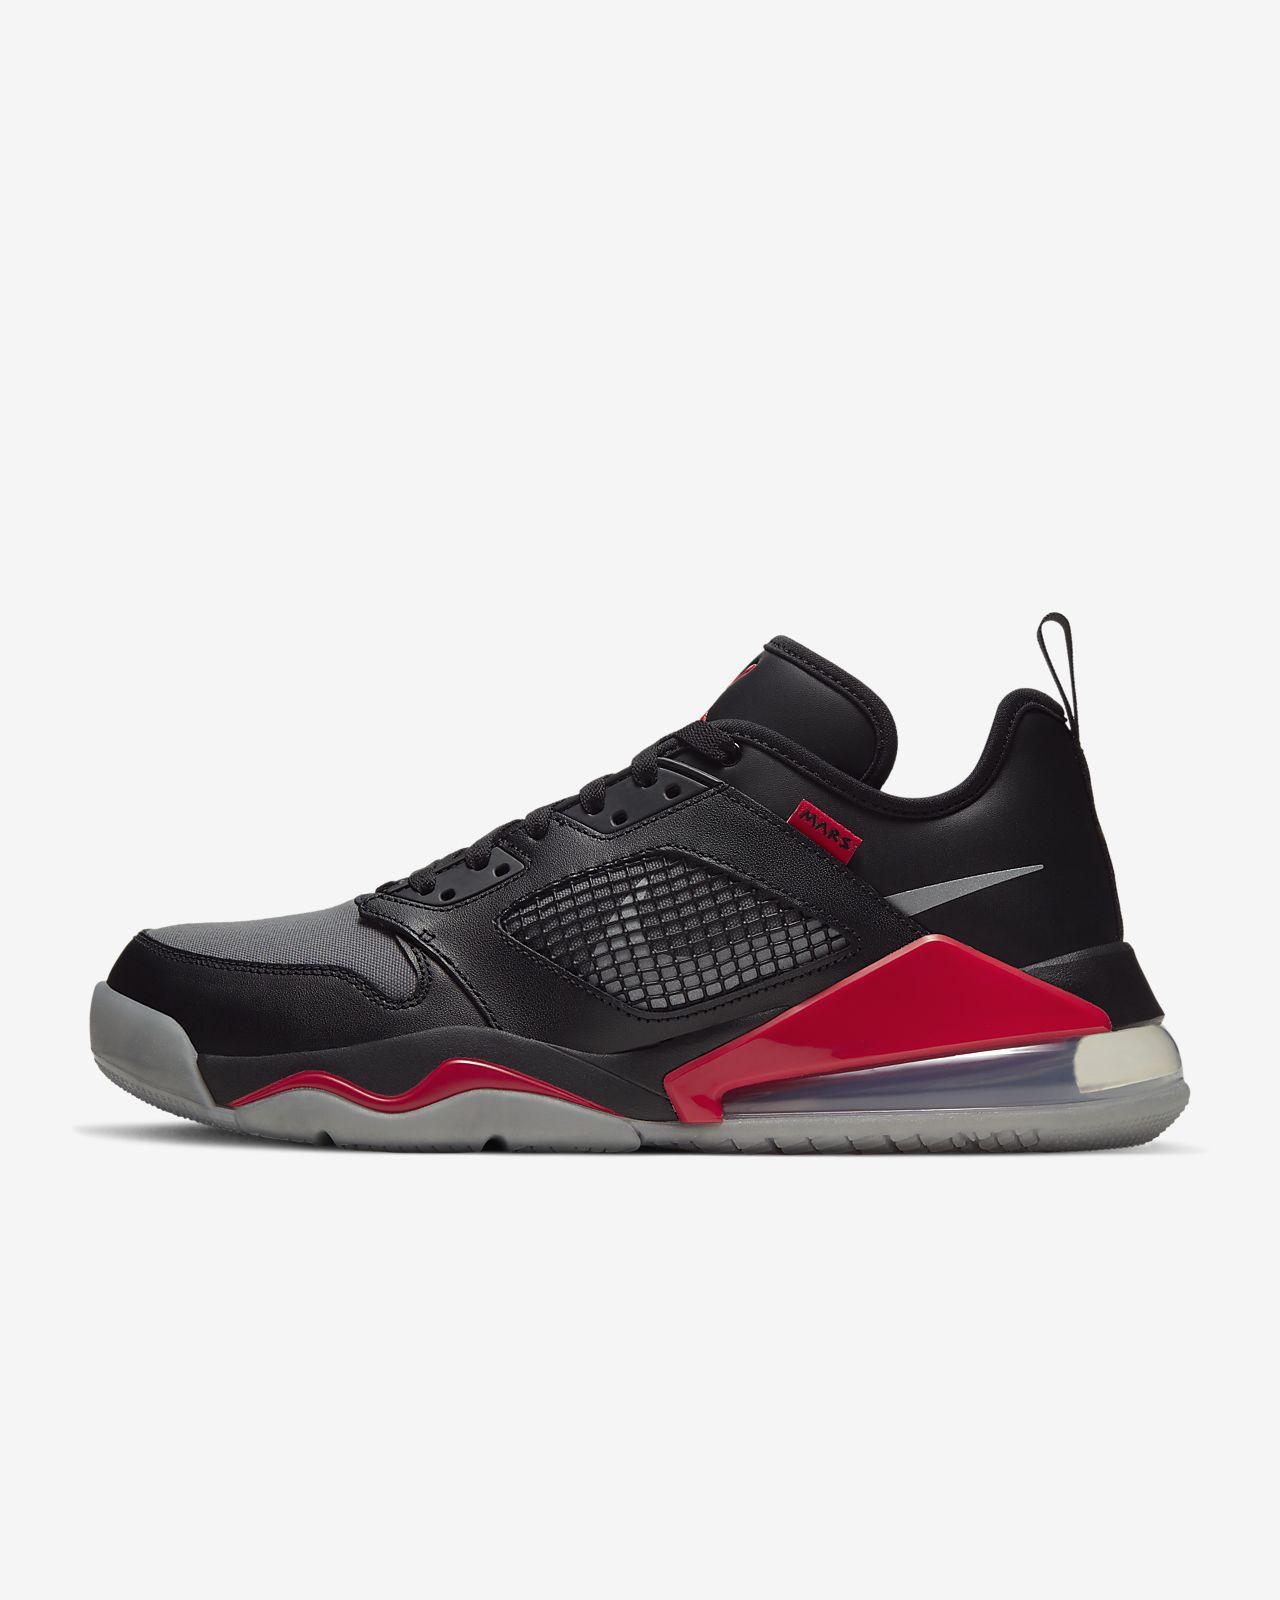 chaussure jordan mars 270